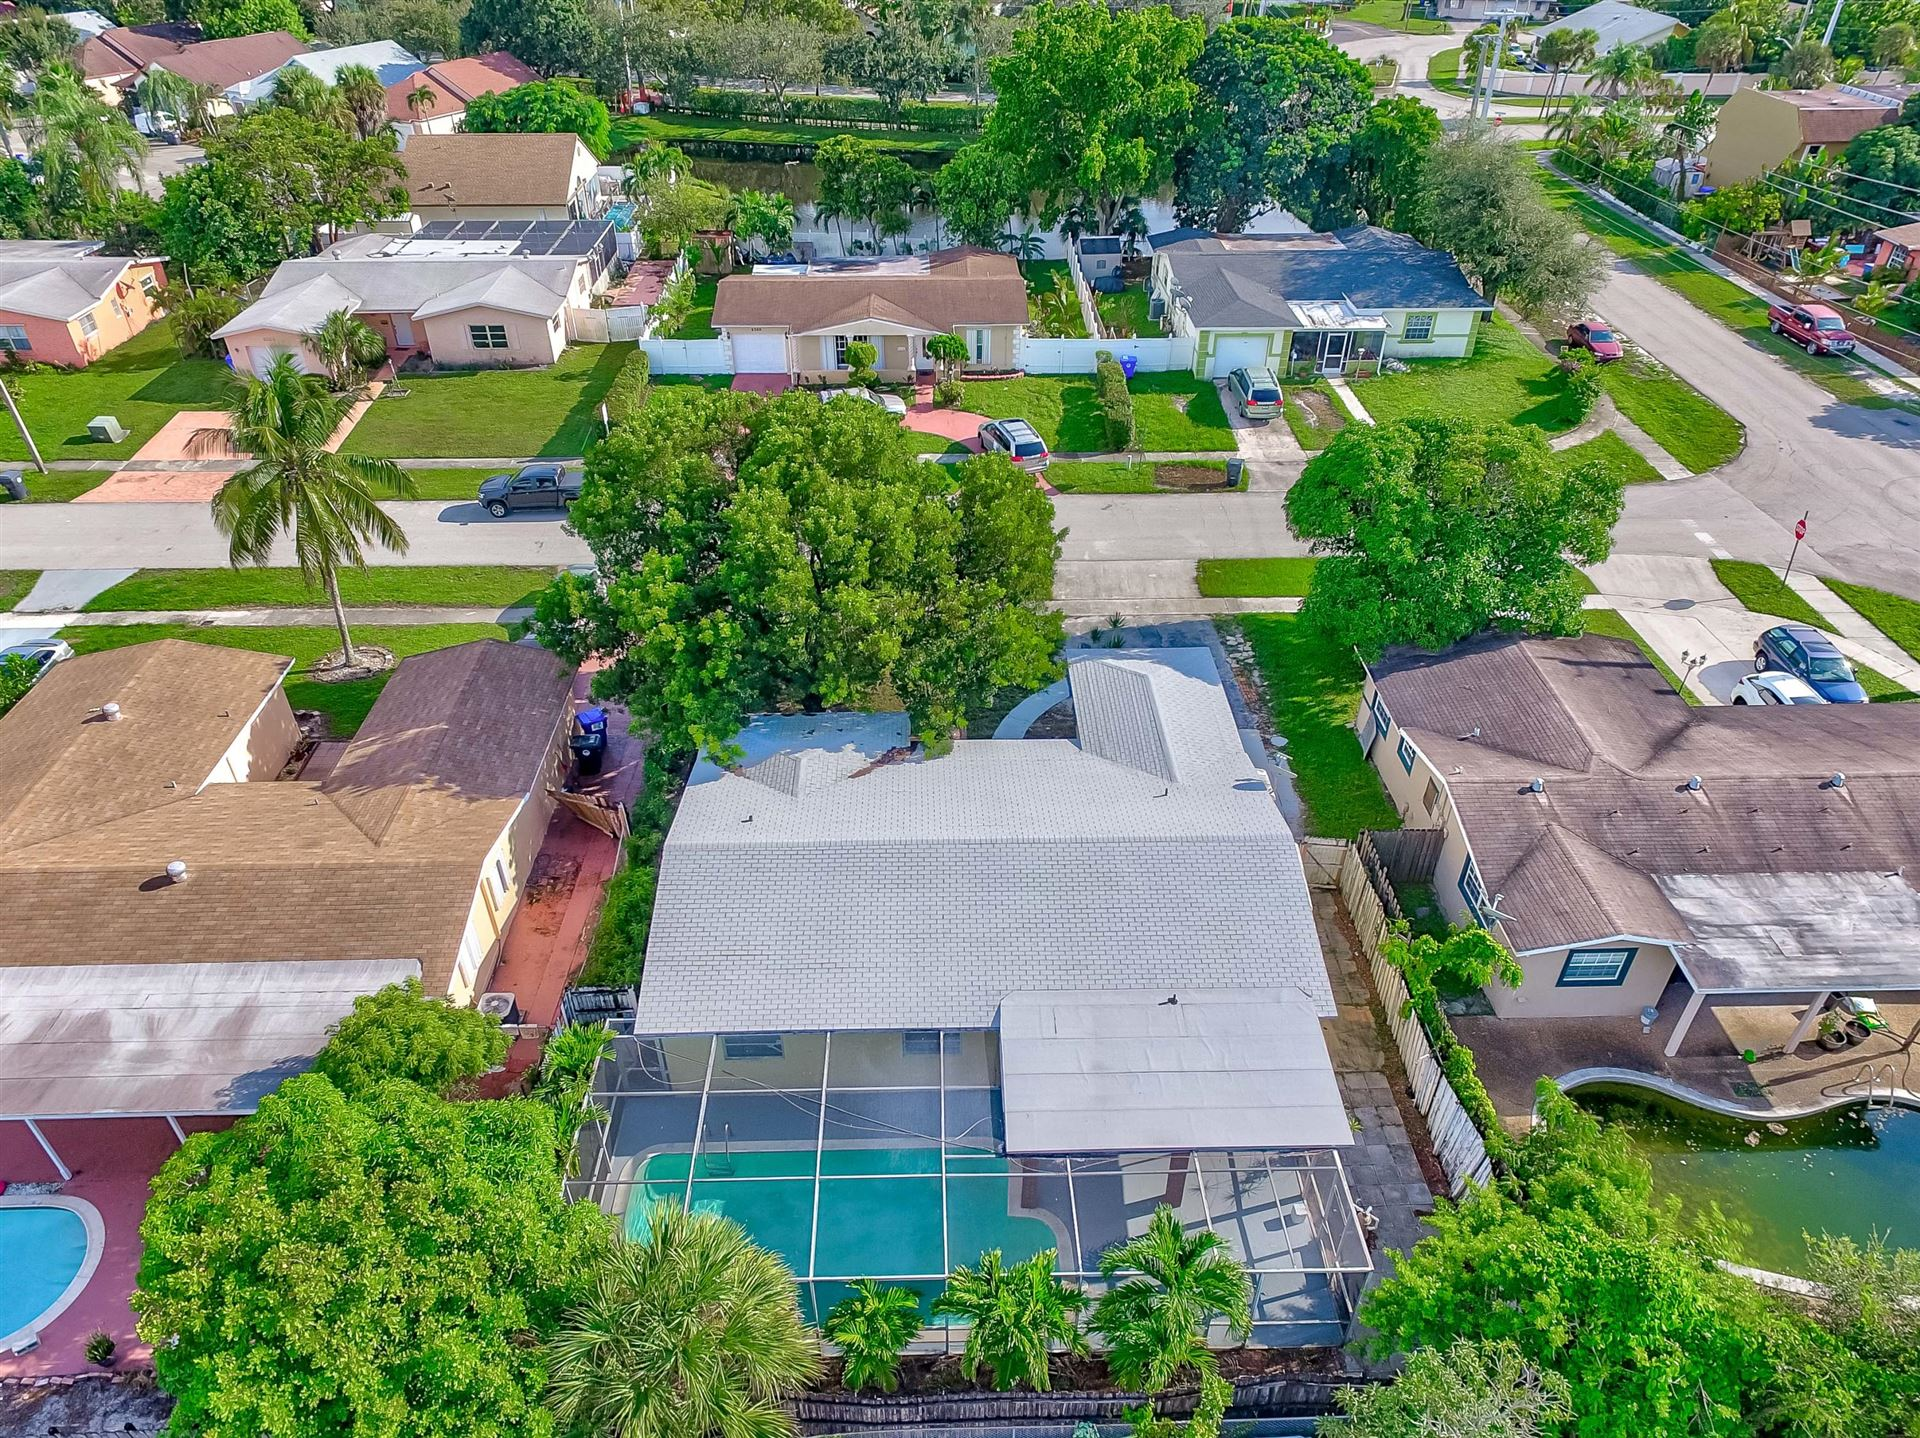 6371 SW 10 Court, North Lauderdale, FL 33068 - #: RX-10672258